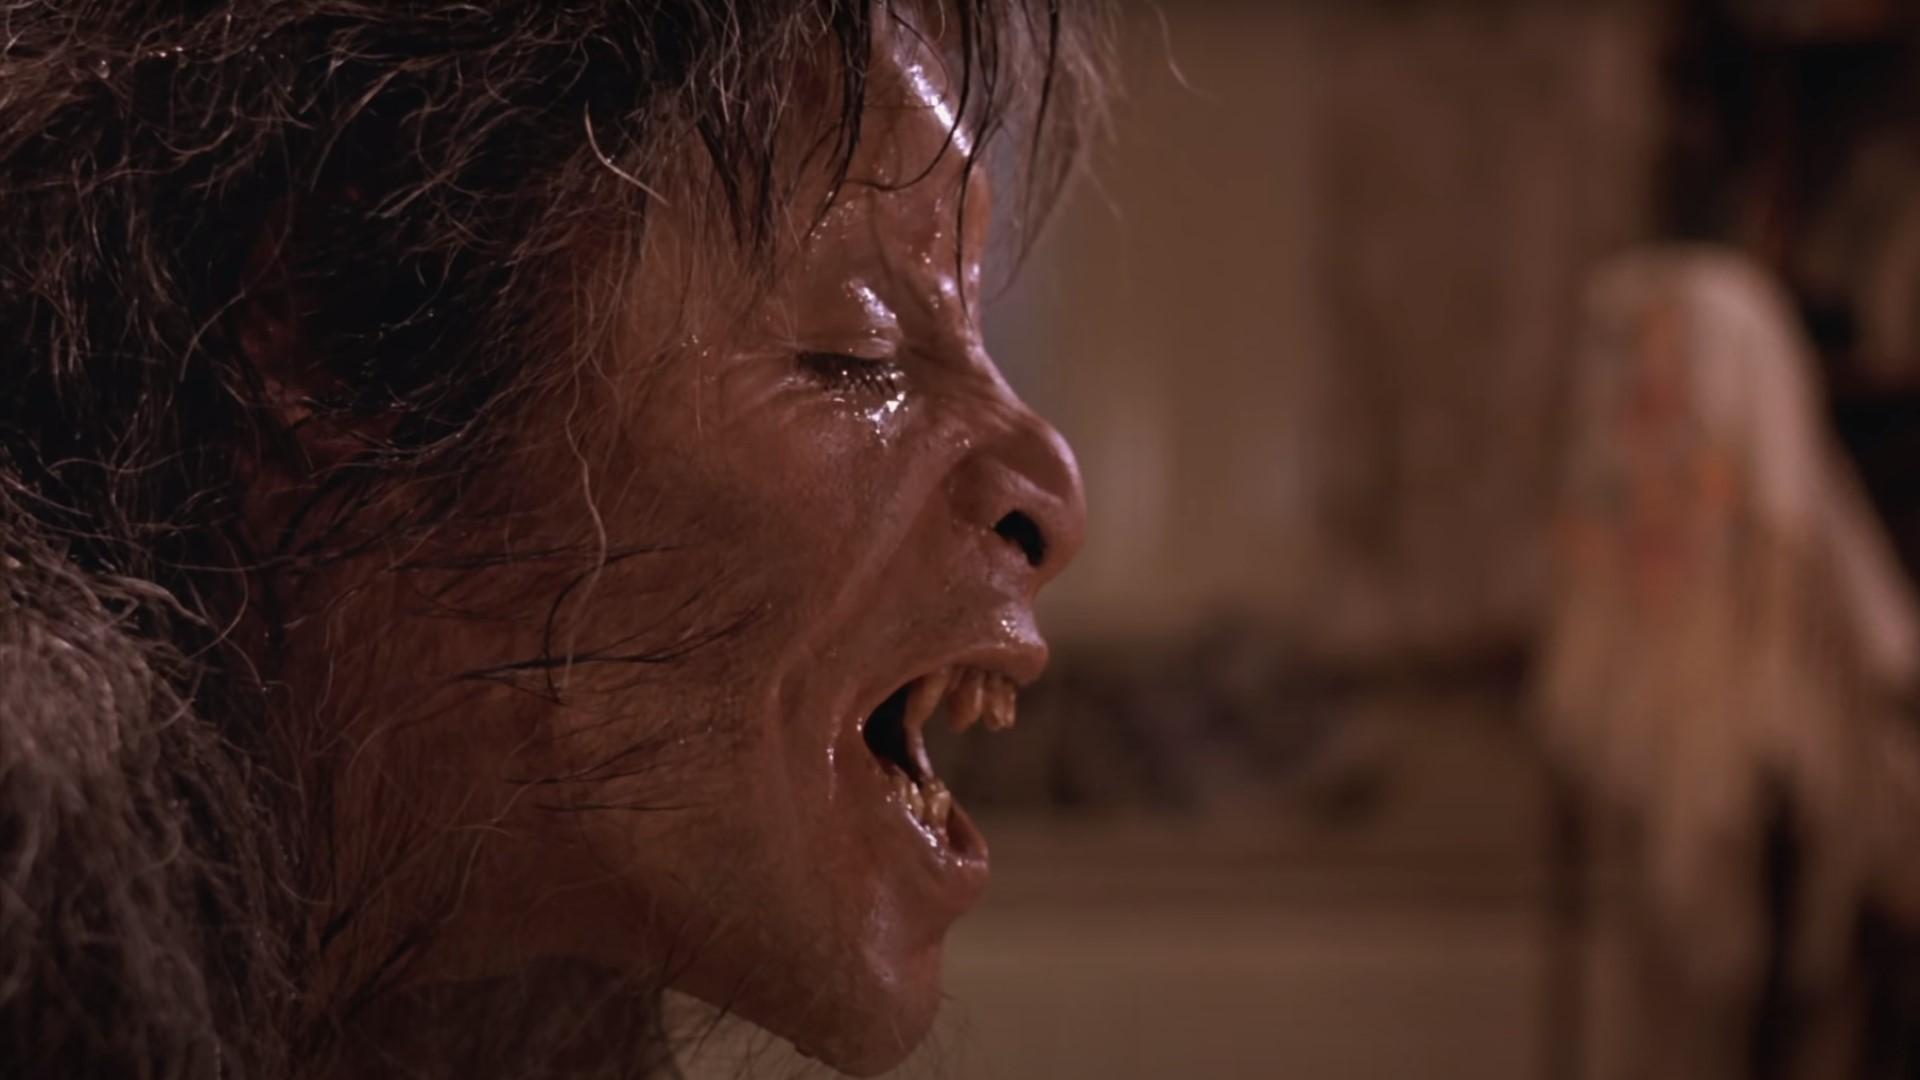 "AN AMERICAN WEREWOLF IN LONDON (1981) - Rick Baker SFX ""Change-O"" Mechanical Werewolf Transformation - Image 22 of 27"